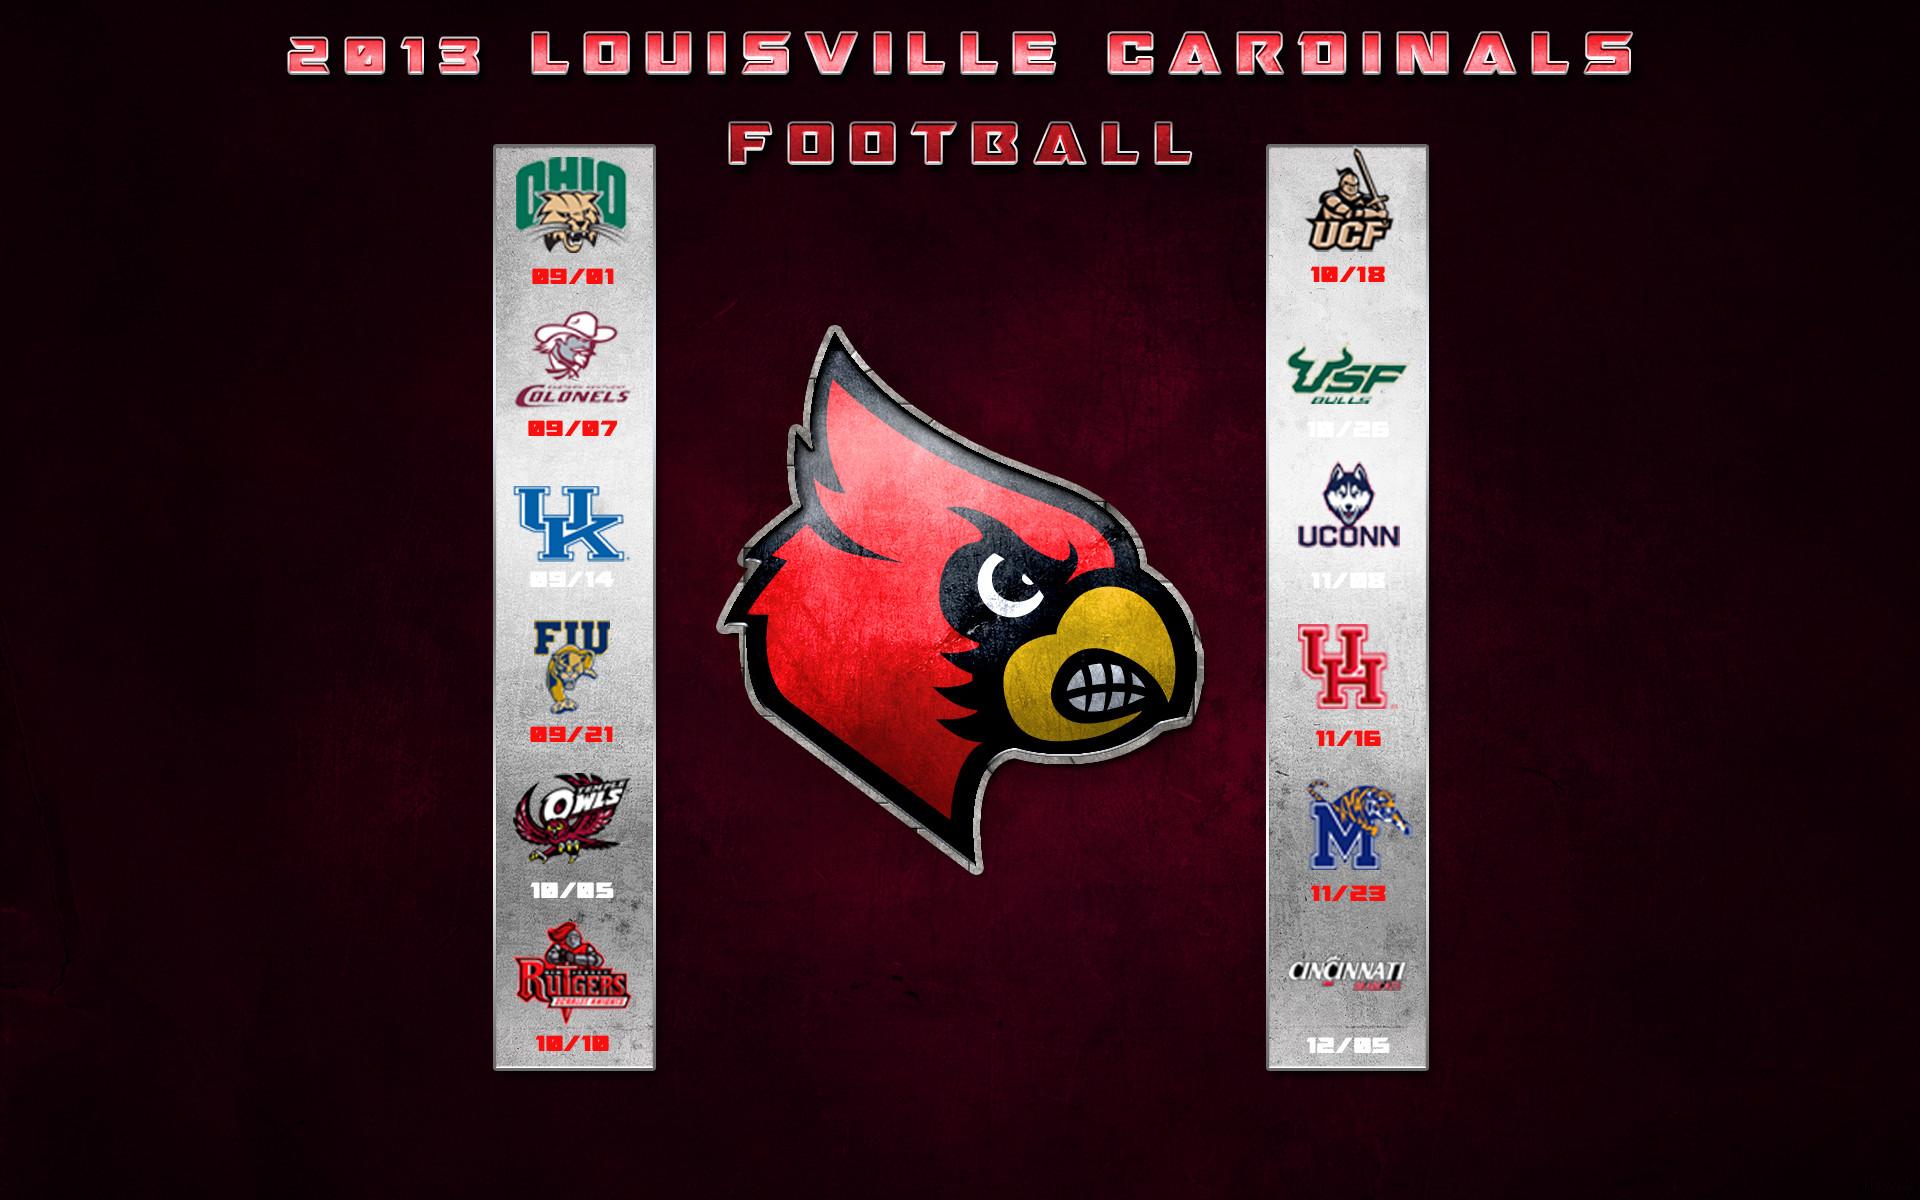 Louisville Cardinals Wallpaper Free 1200×900 Louisville Cardinals Wallpapers  (21 Wallpapers)   Adorable